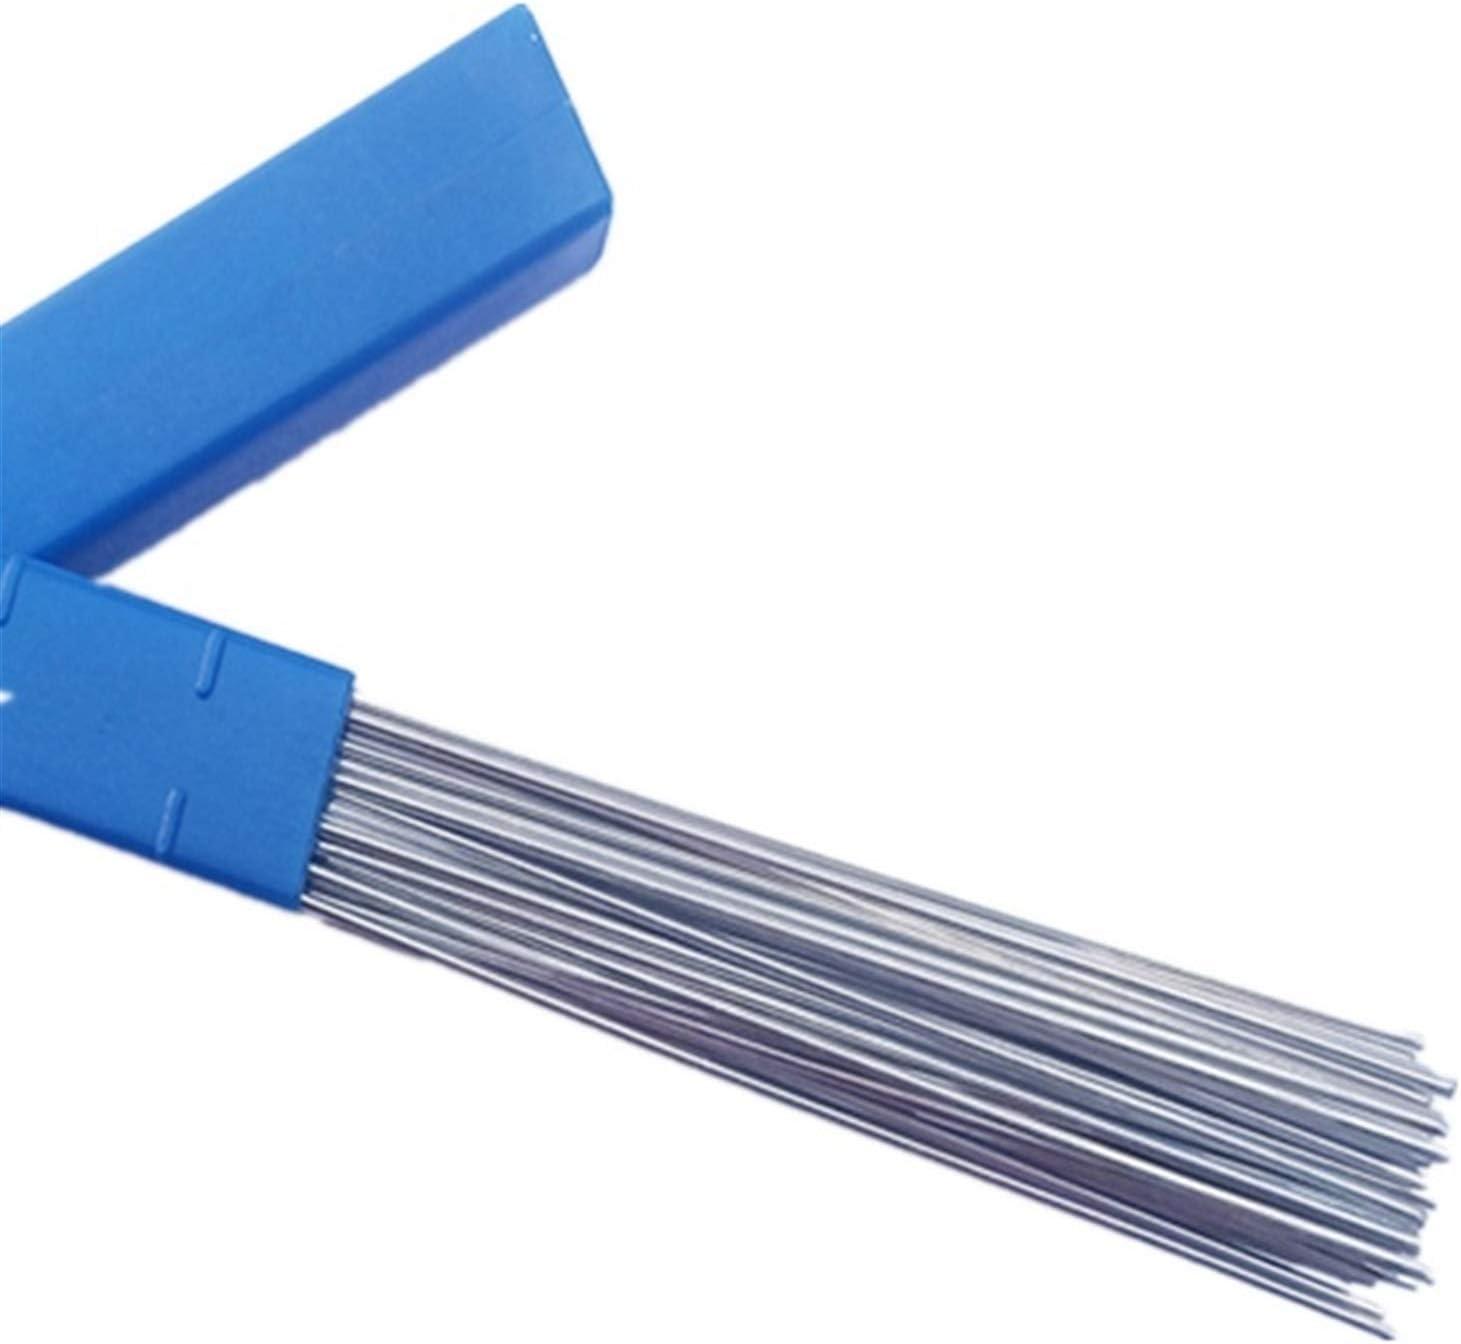 Yangg-Welding Rods Durable service 20 50pcs Max 80% OFF Temperature Low We Aluminum